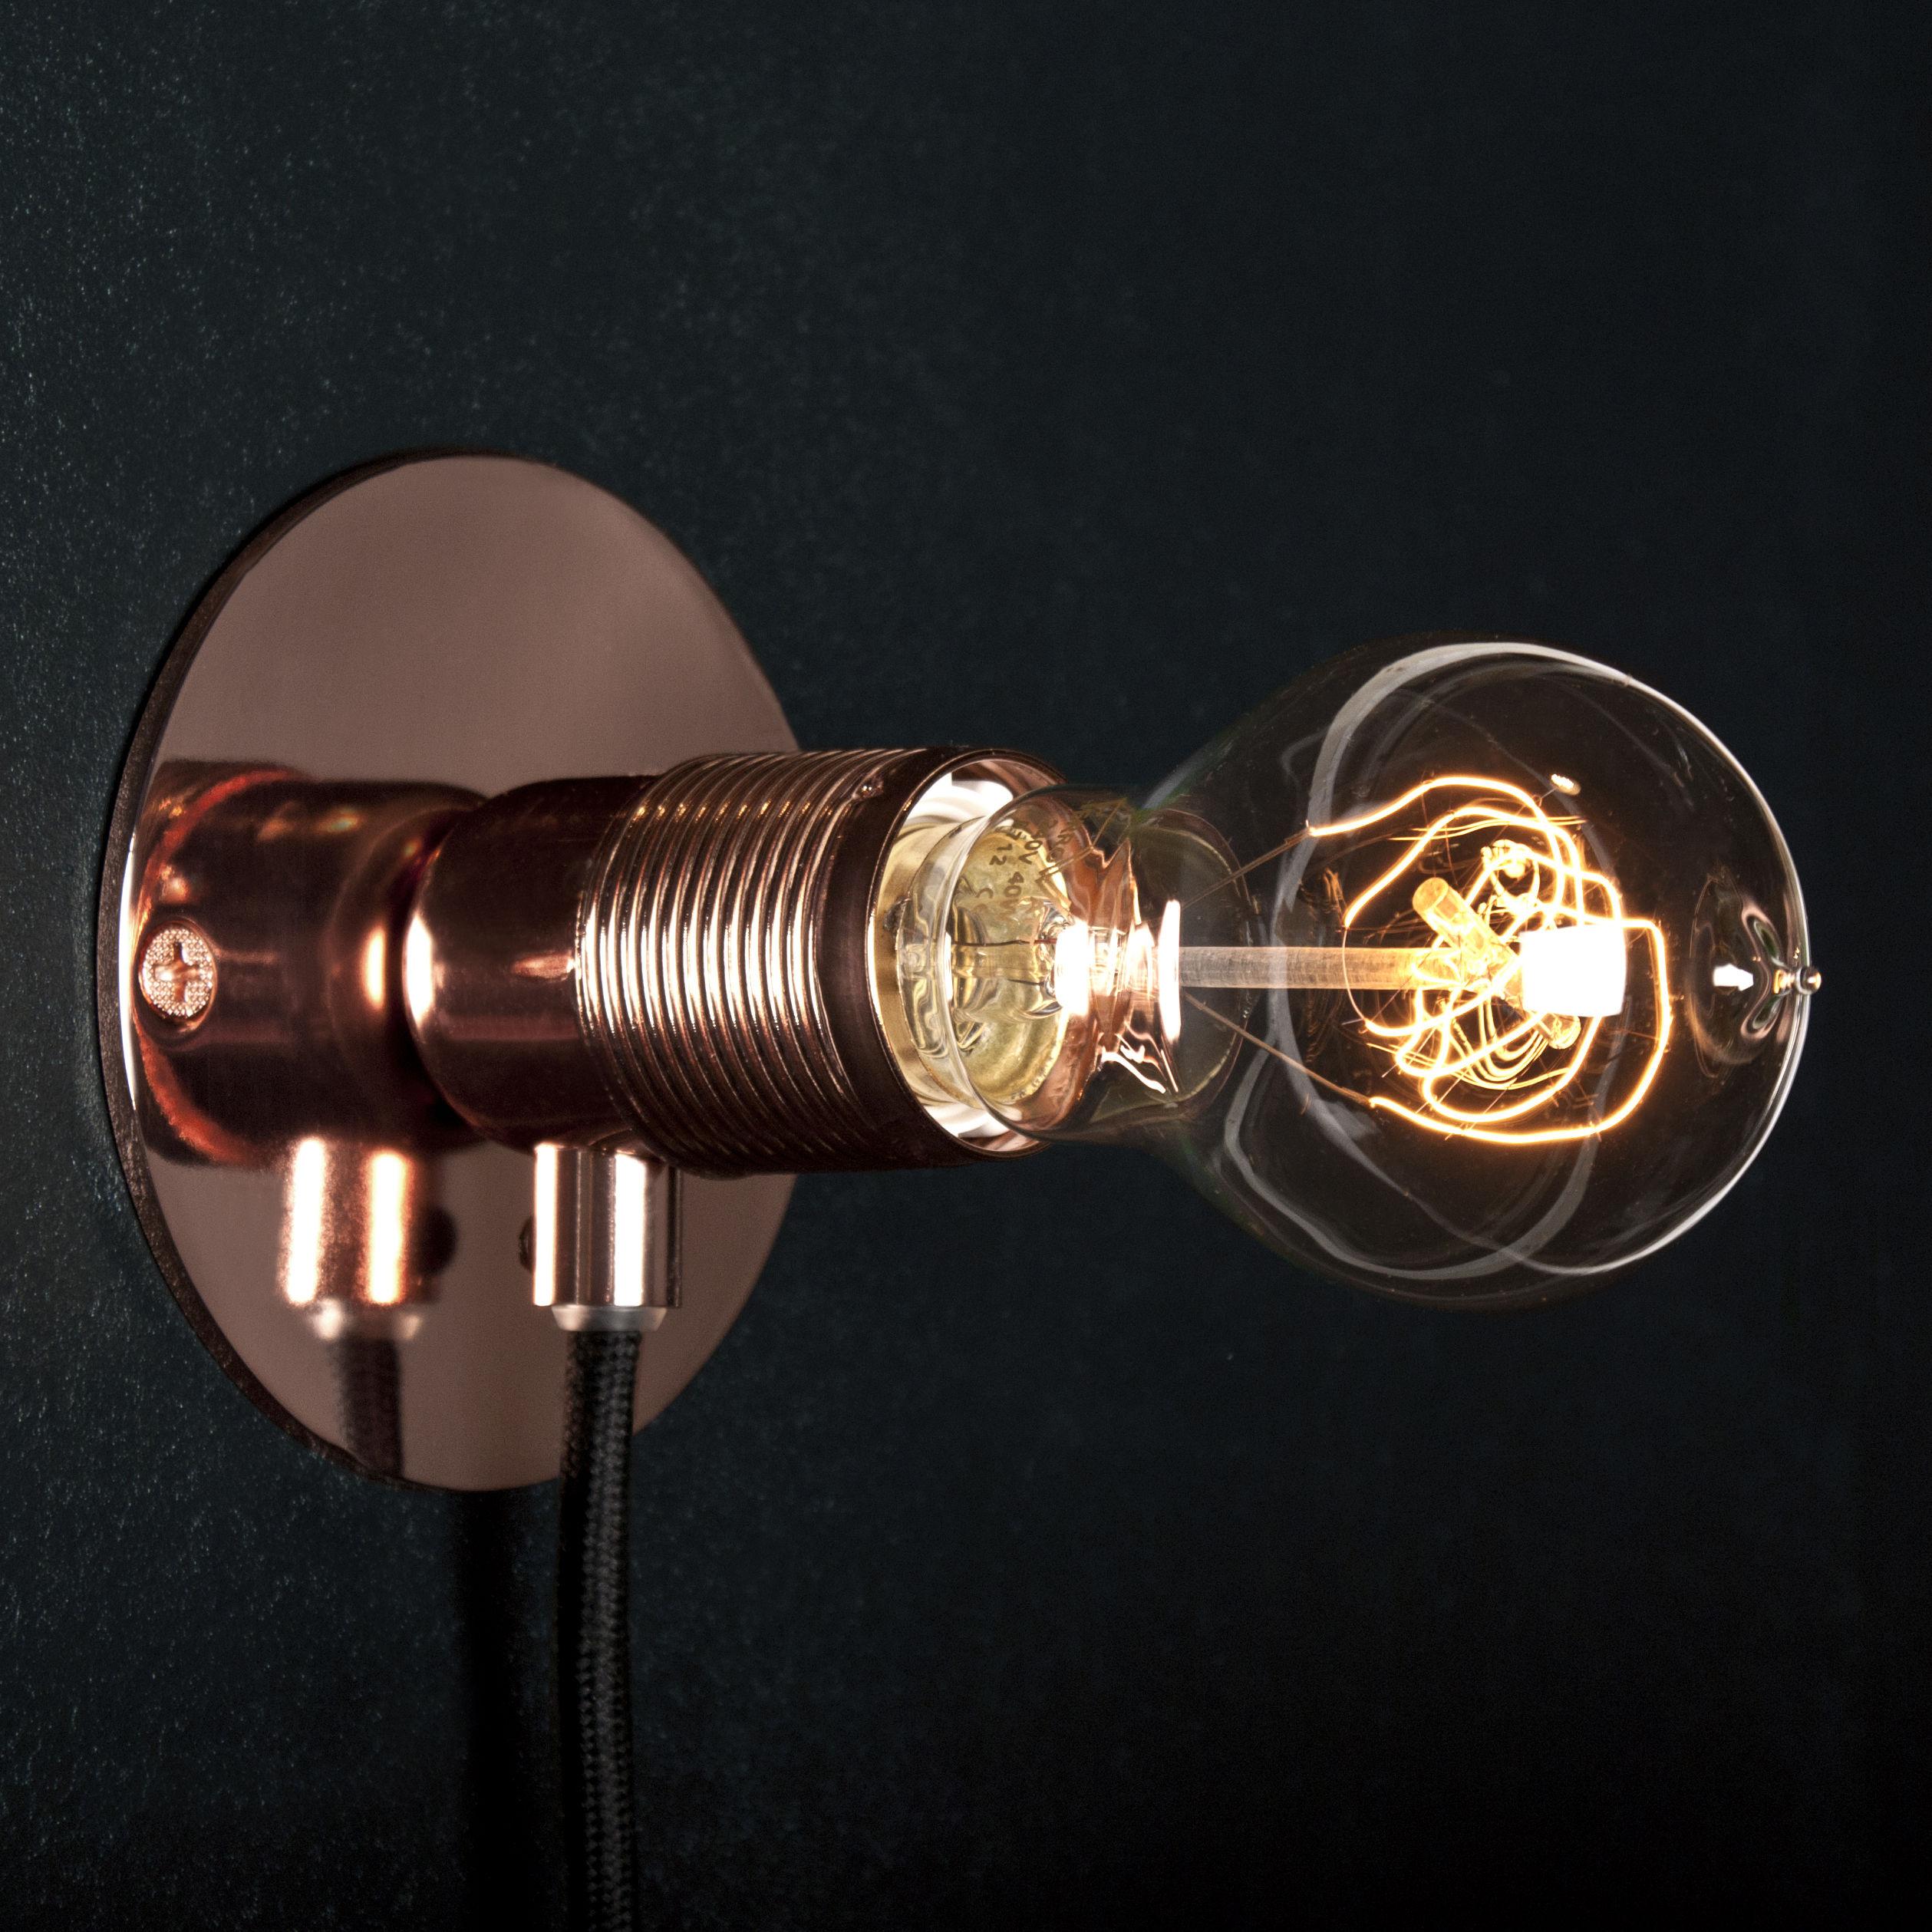 Lighting - Wall Lights - Frama Kit Wall light with plug - Small - Ø 12 cm by Frama  - Copper - Metal